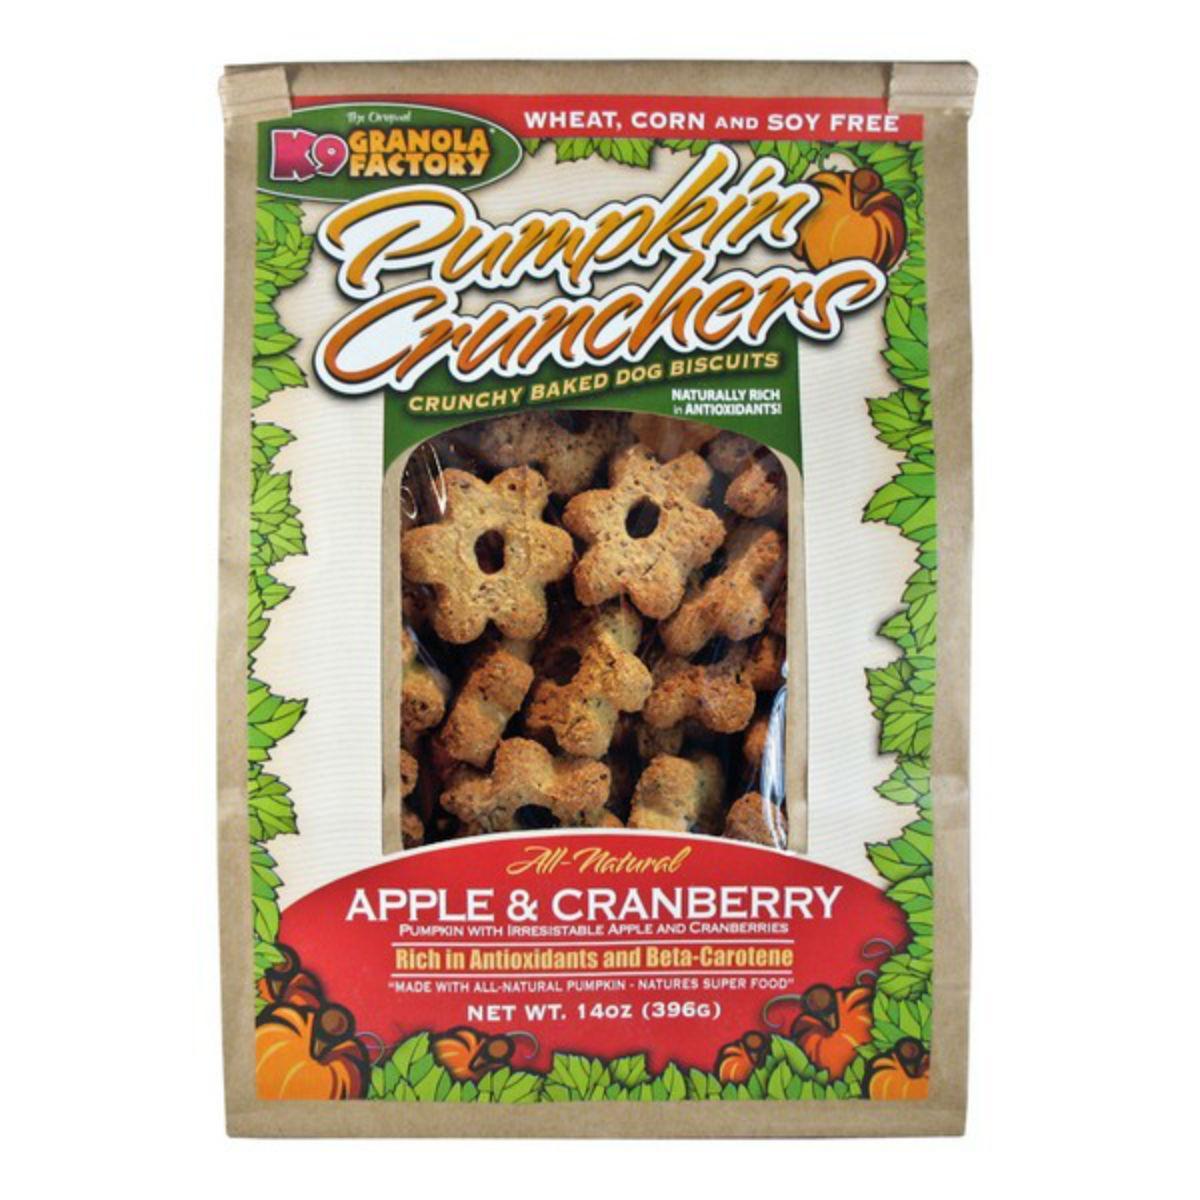 K9 Granola Factory Pumpkin Crunchers Dog Treat - Apple & Cranberry